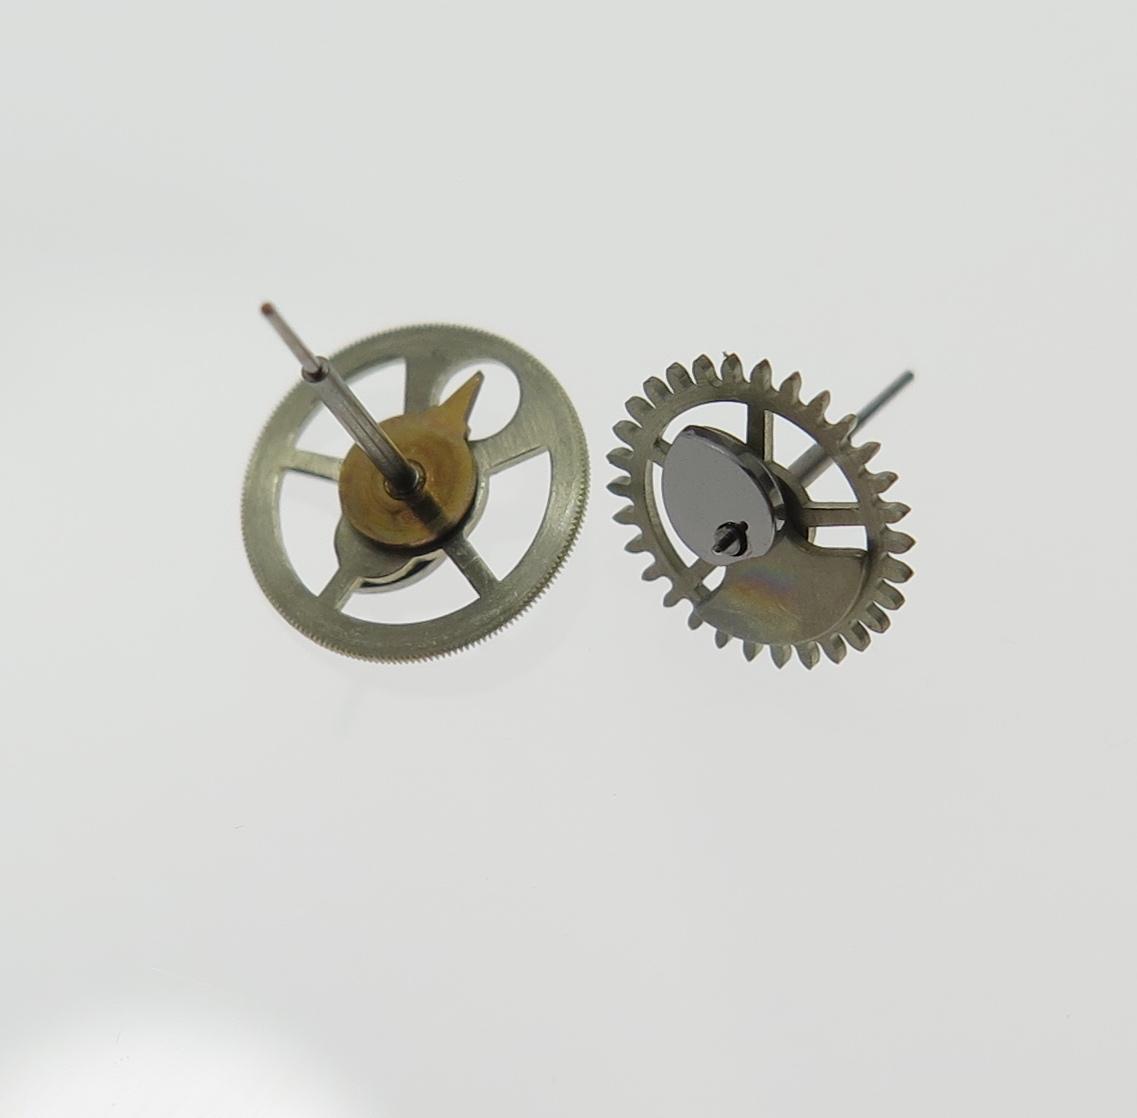 The chronograph wheel